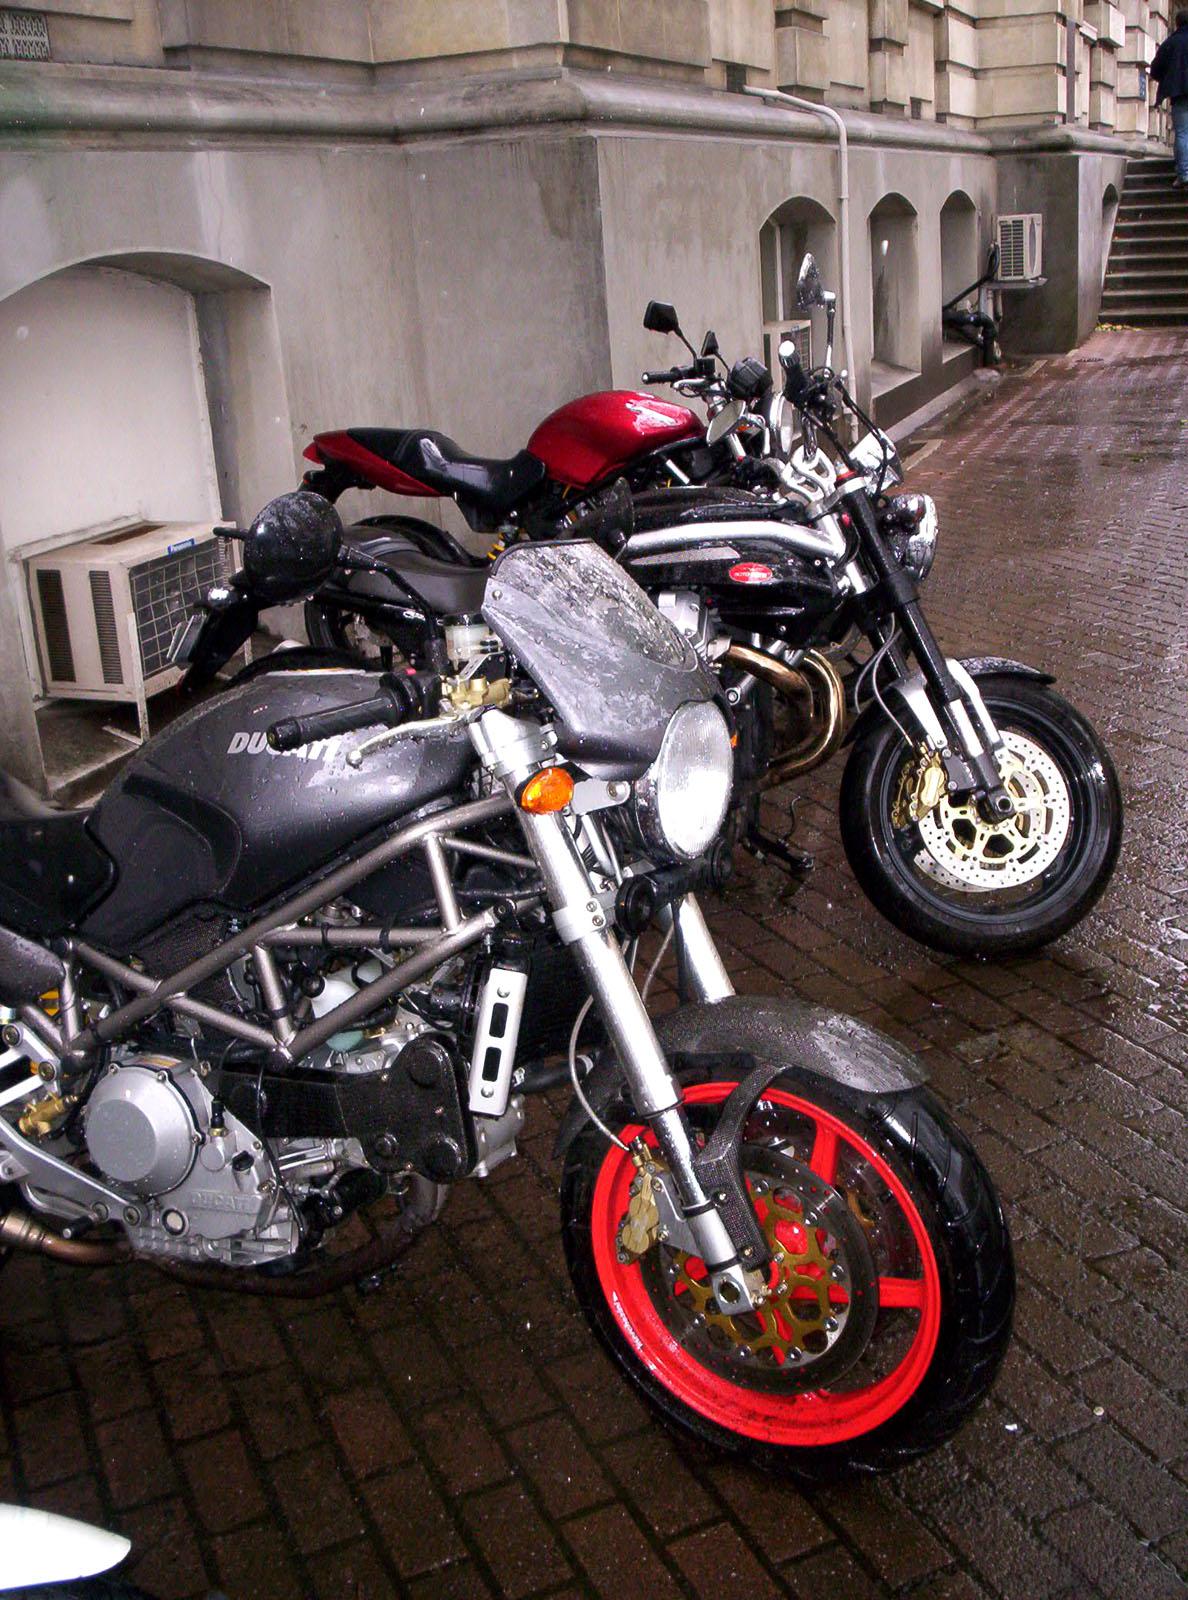 Ducati in the rain photo